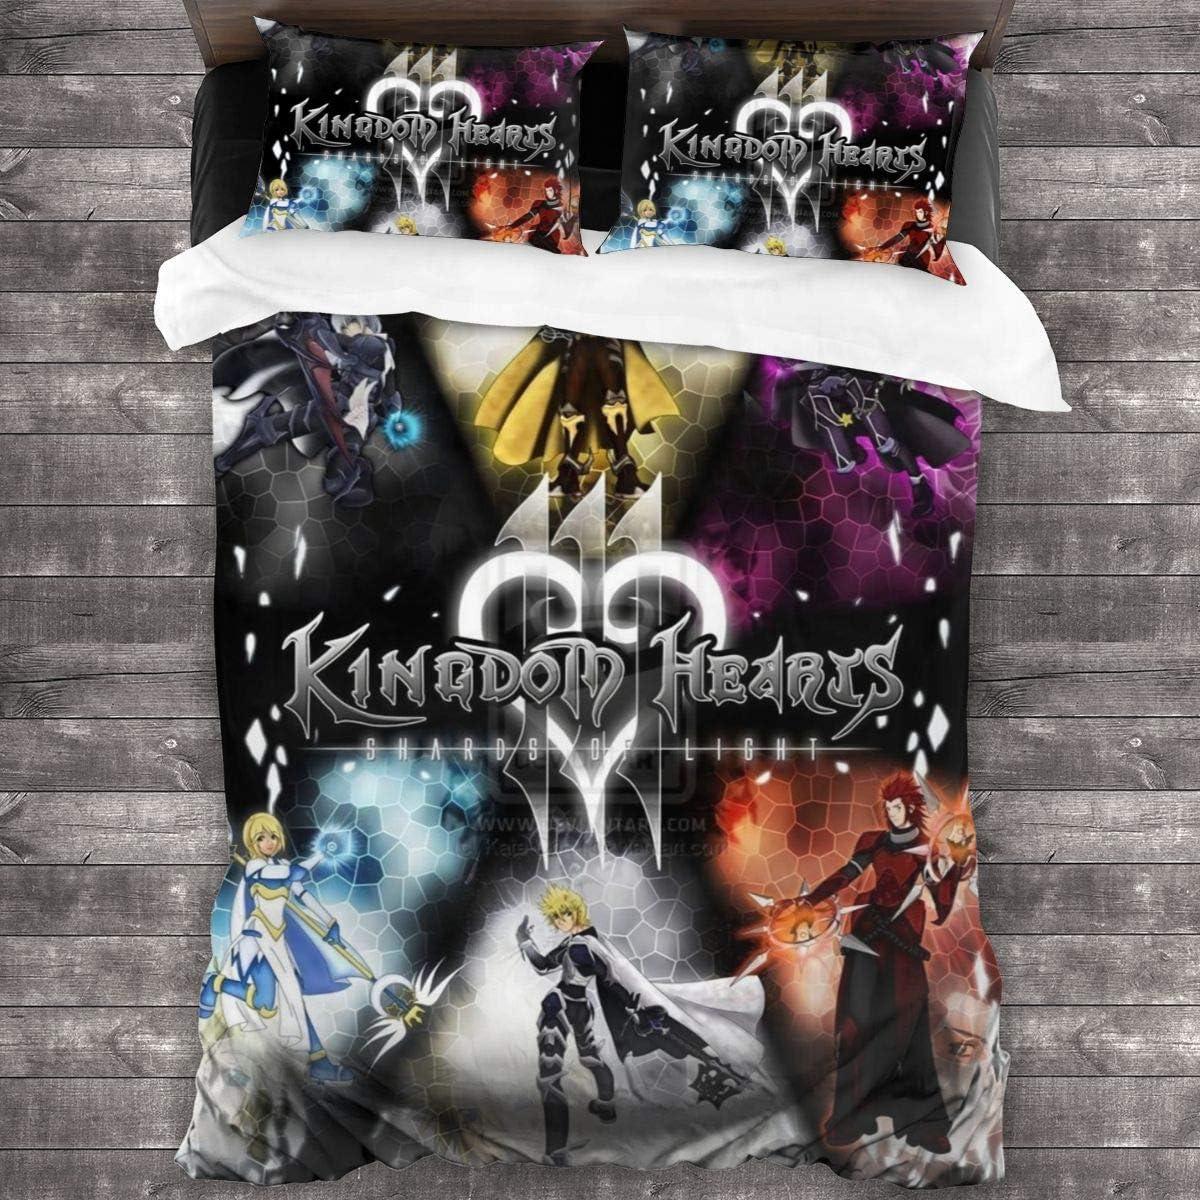 Cawkkj Kingdom-Hearts Kids/Girl Bedding Set Soft Microfiber Twin Bed Comforter King Sheet 3 Piece One Size